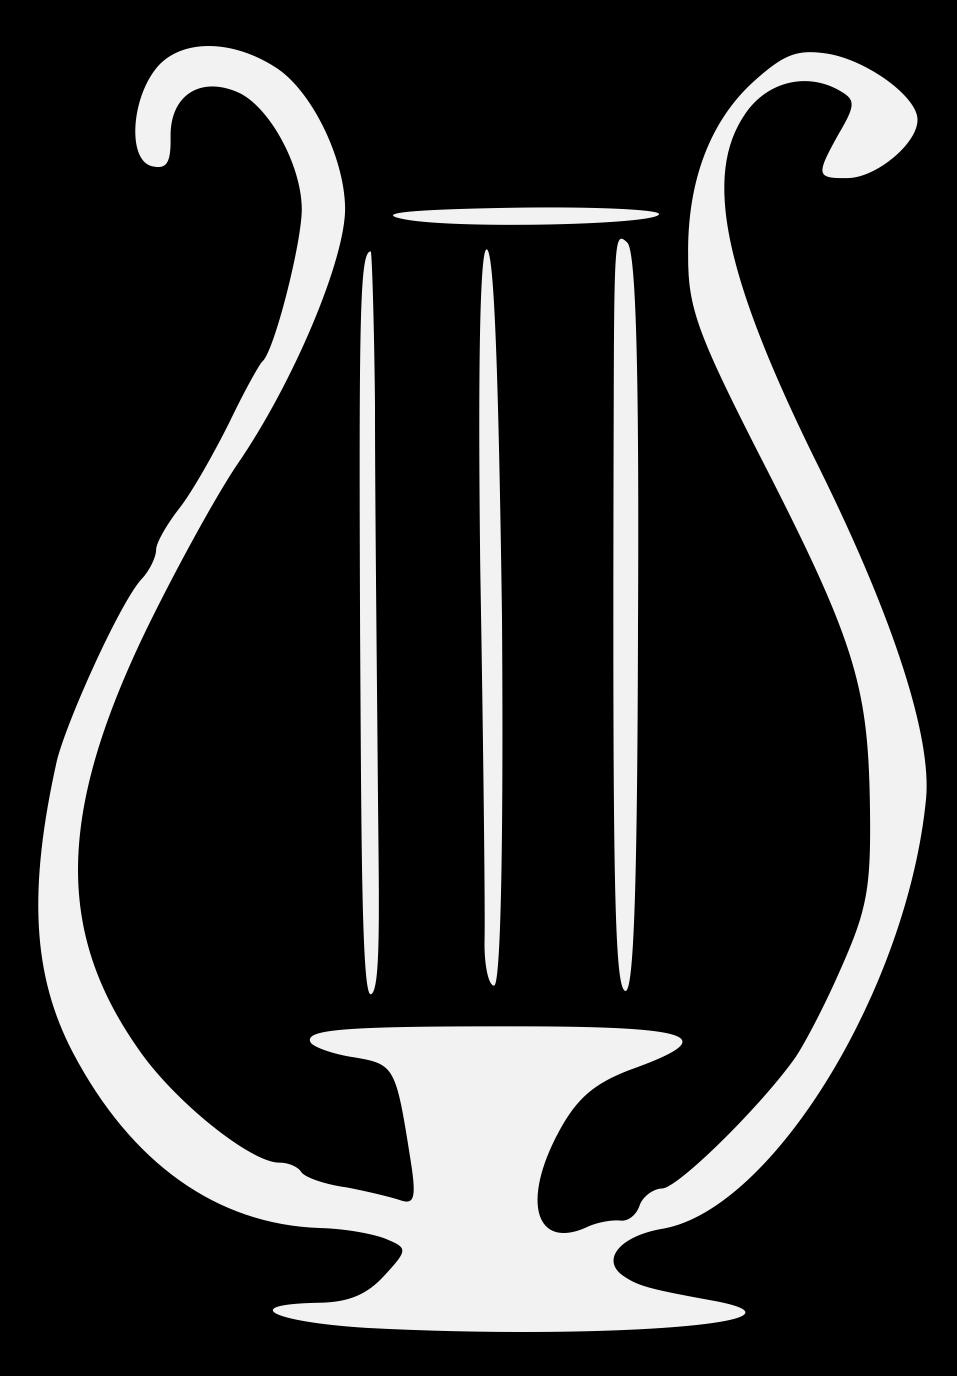 Greek clipart lyre. Drawing at getdrawings com